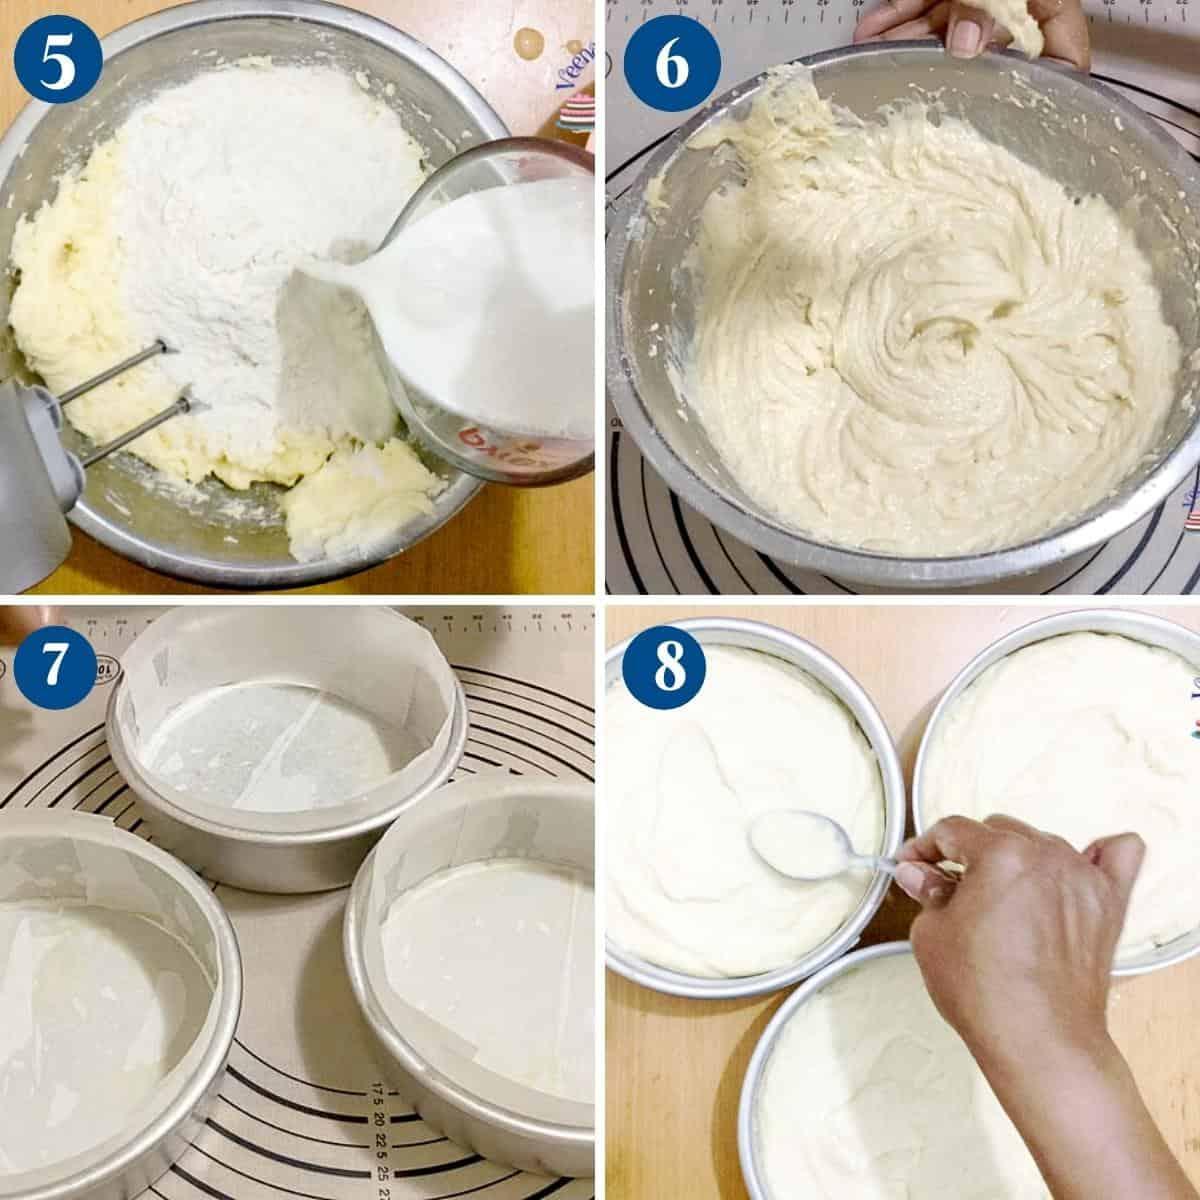 Progress pictures collage making vanilla bean cake batter.